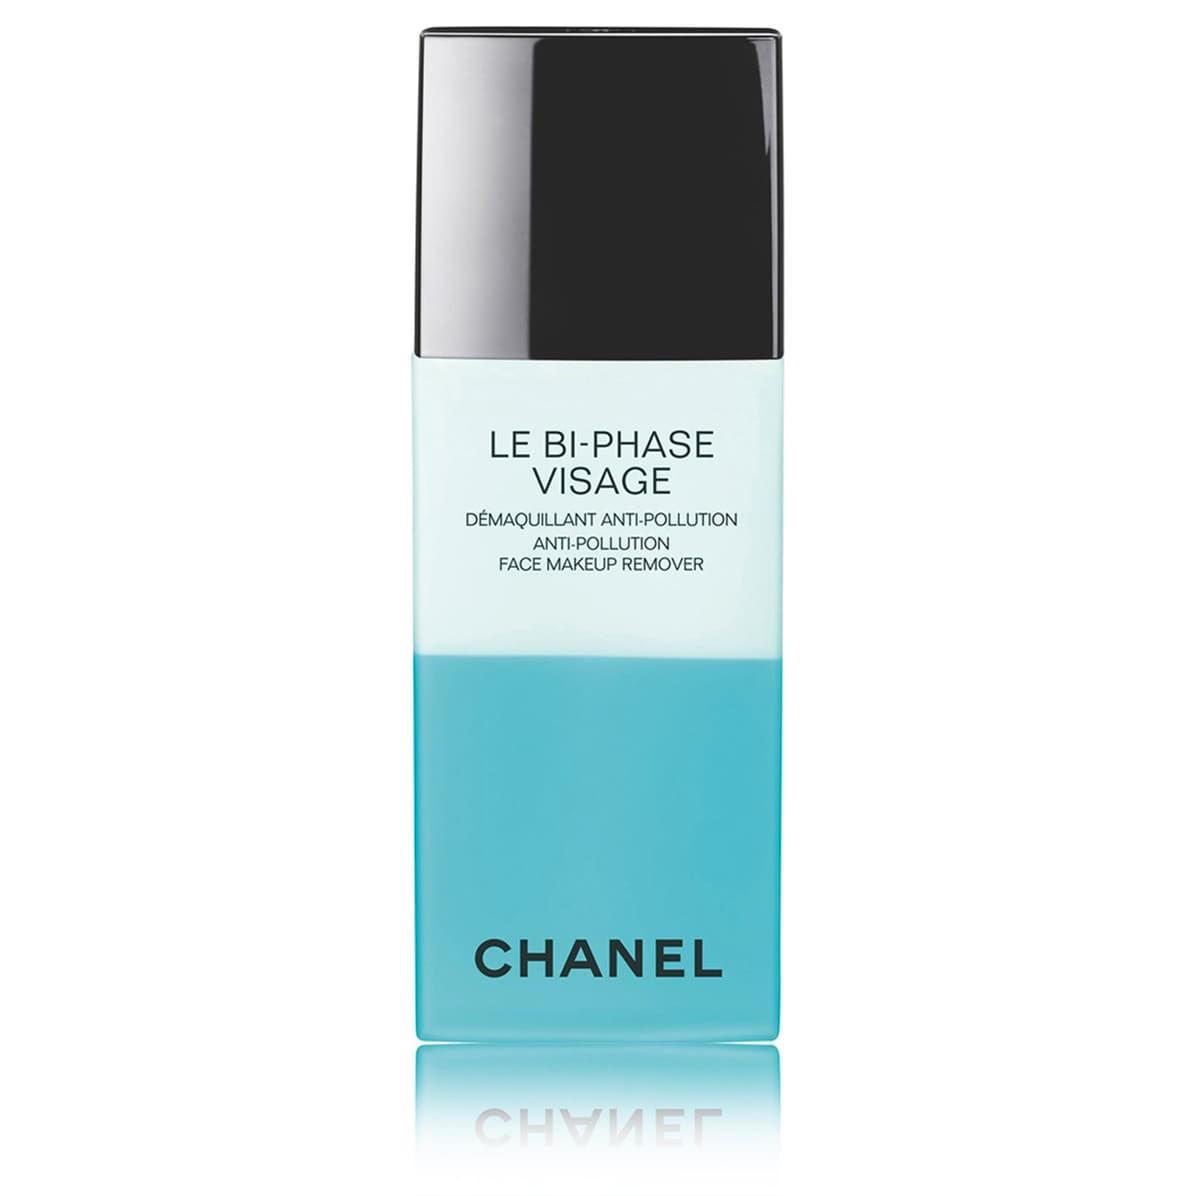 Chanel Le Bi-Phase Visage Anti-Pollution Makeup Remover